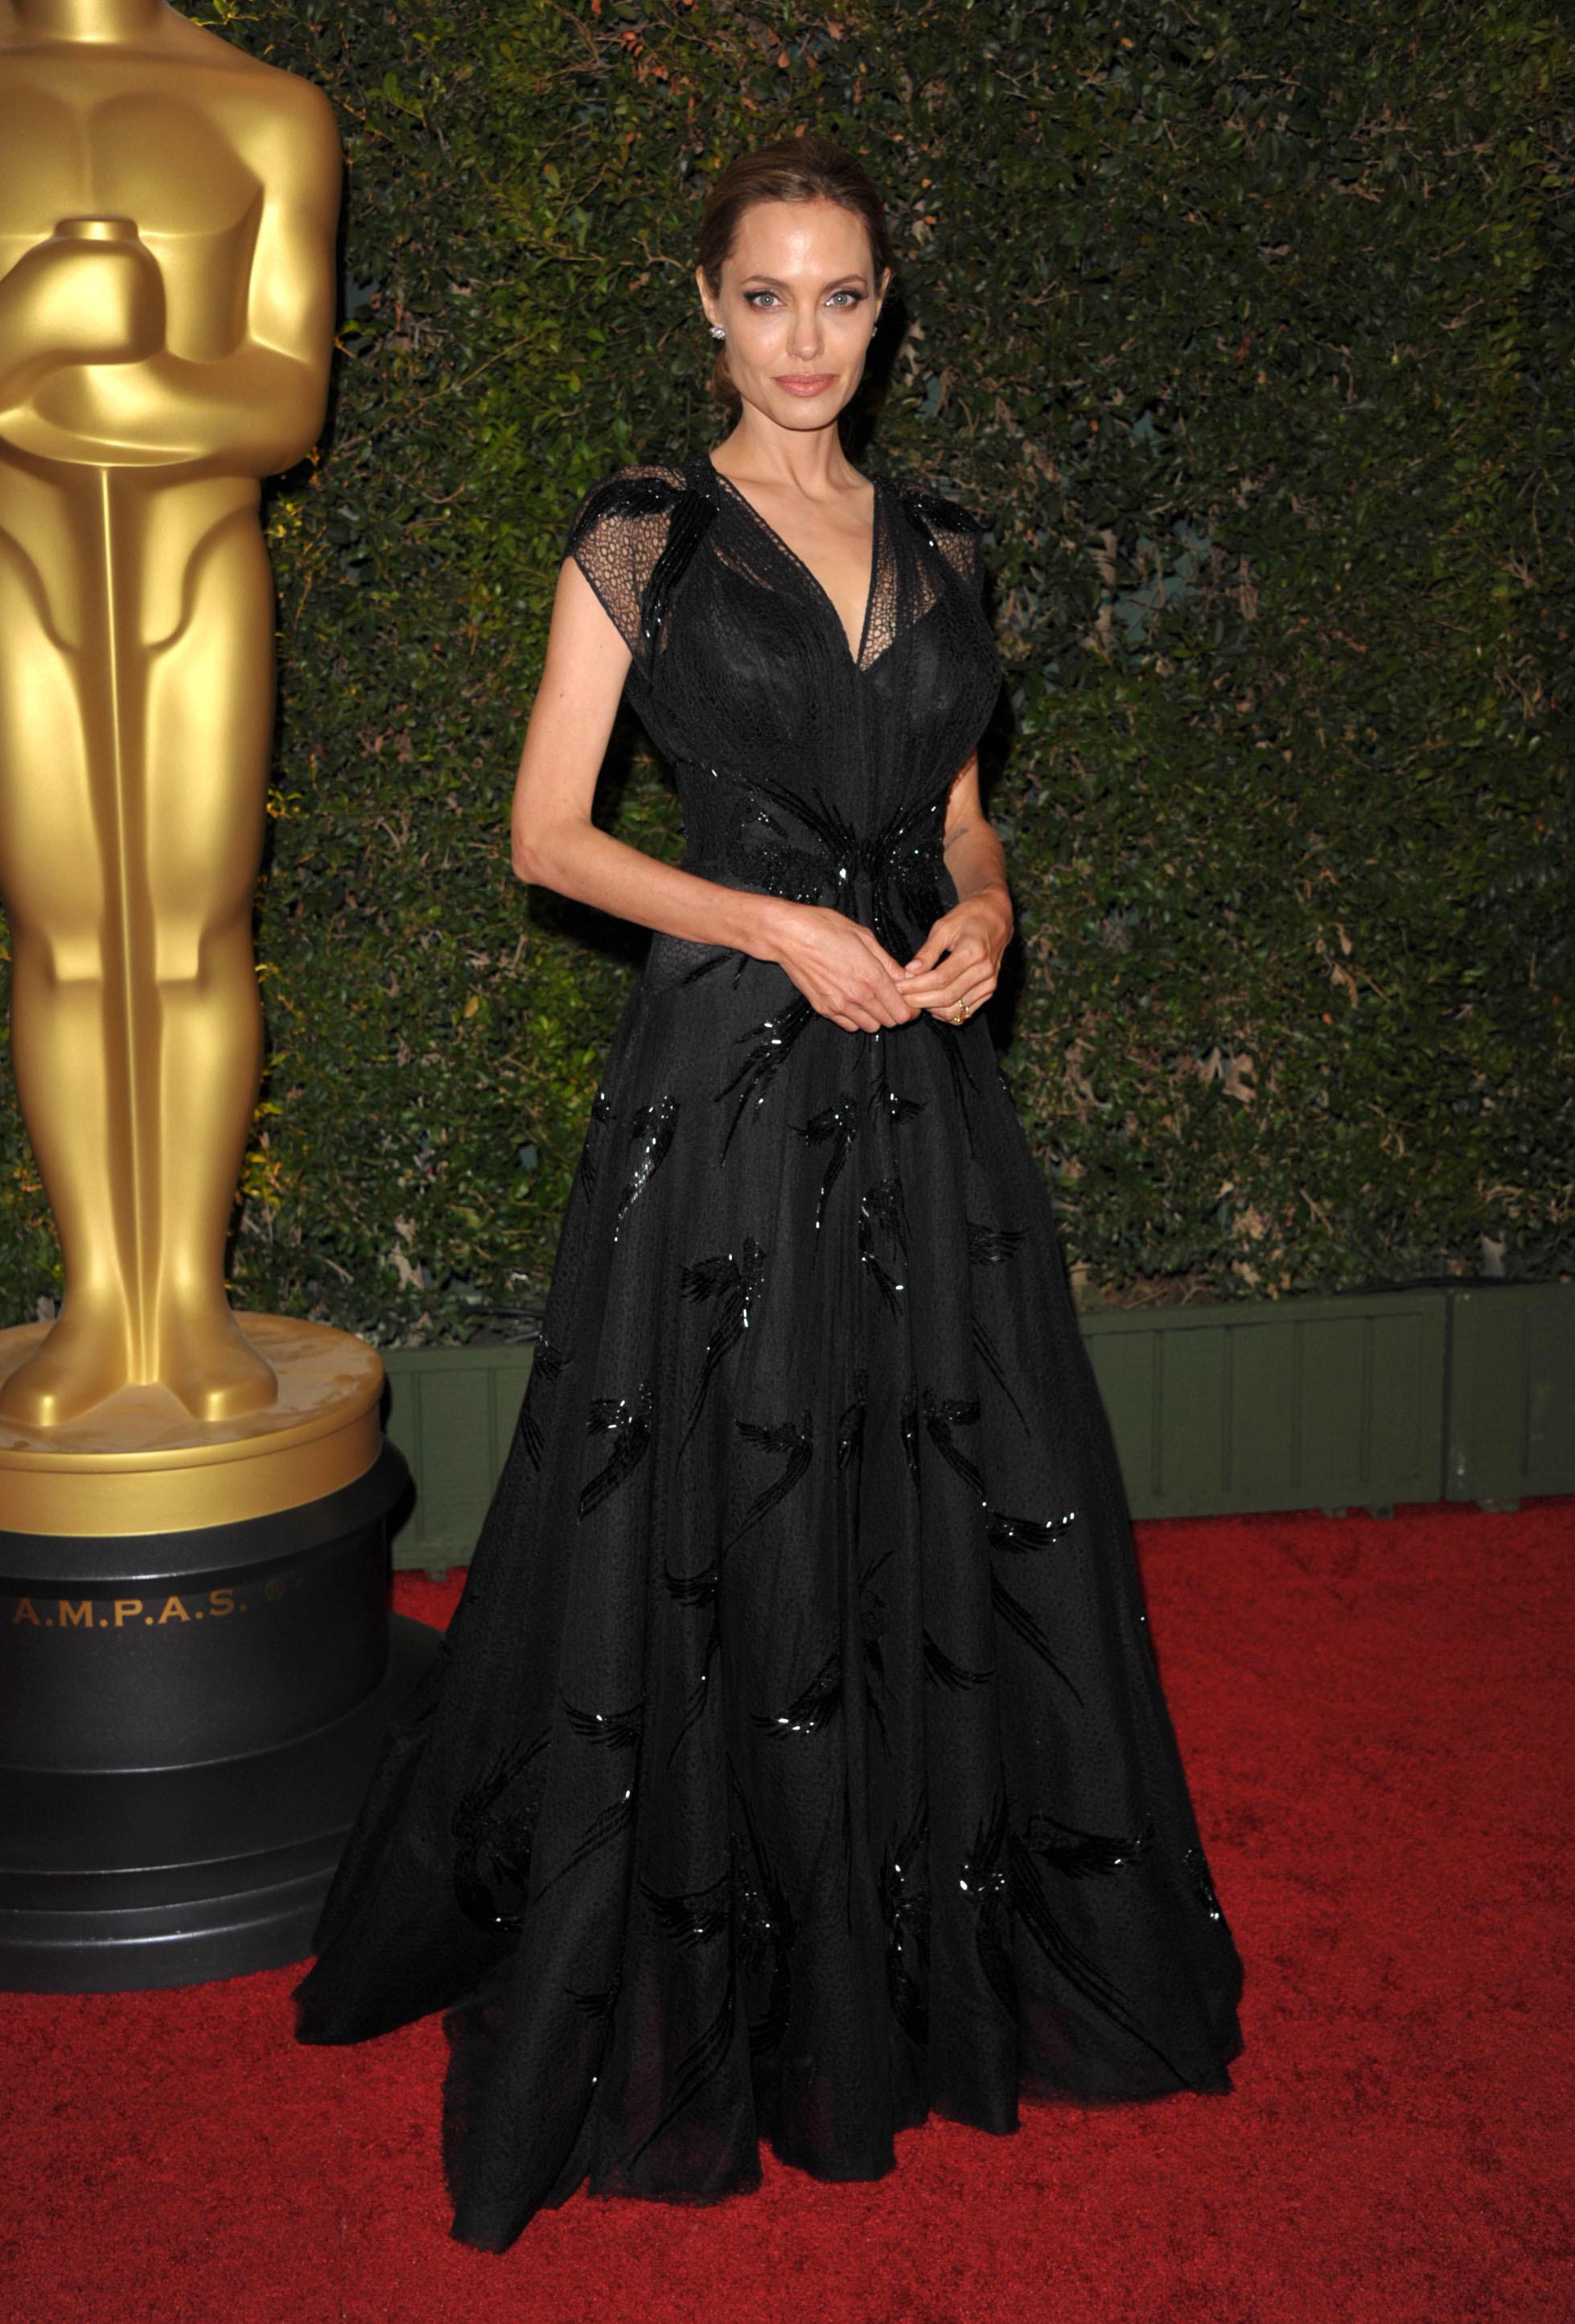 Angelina Jolie Governors Awards